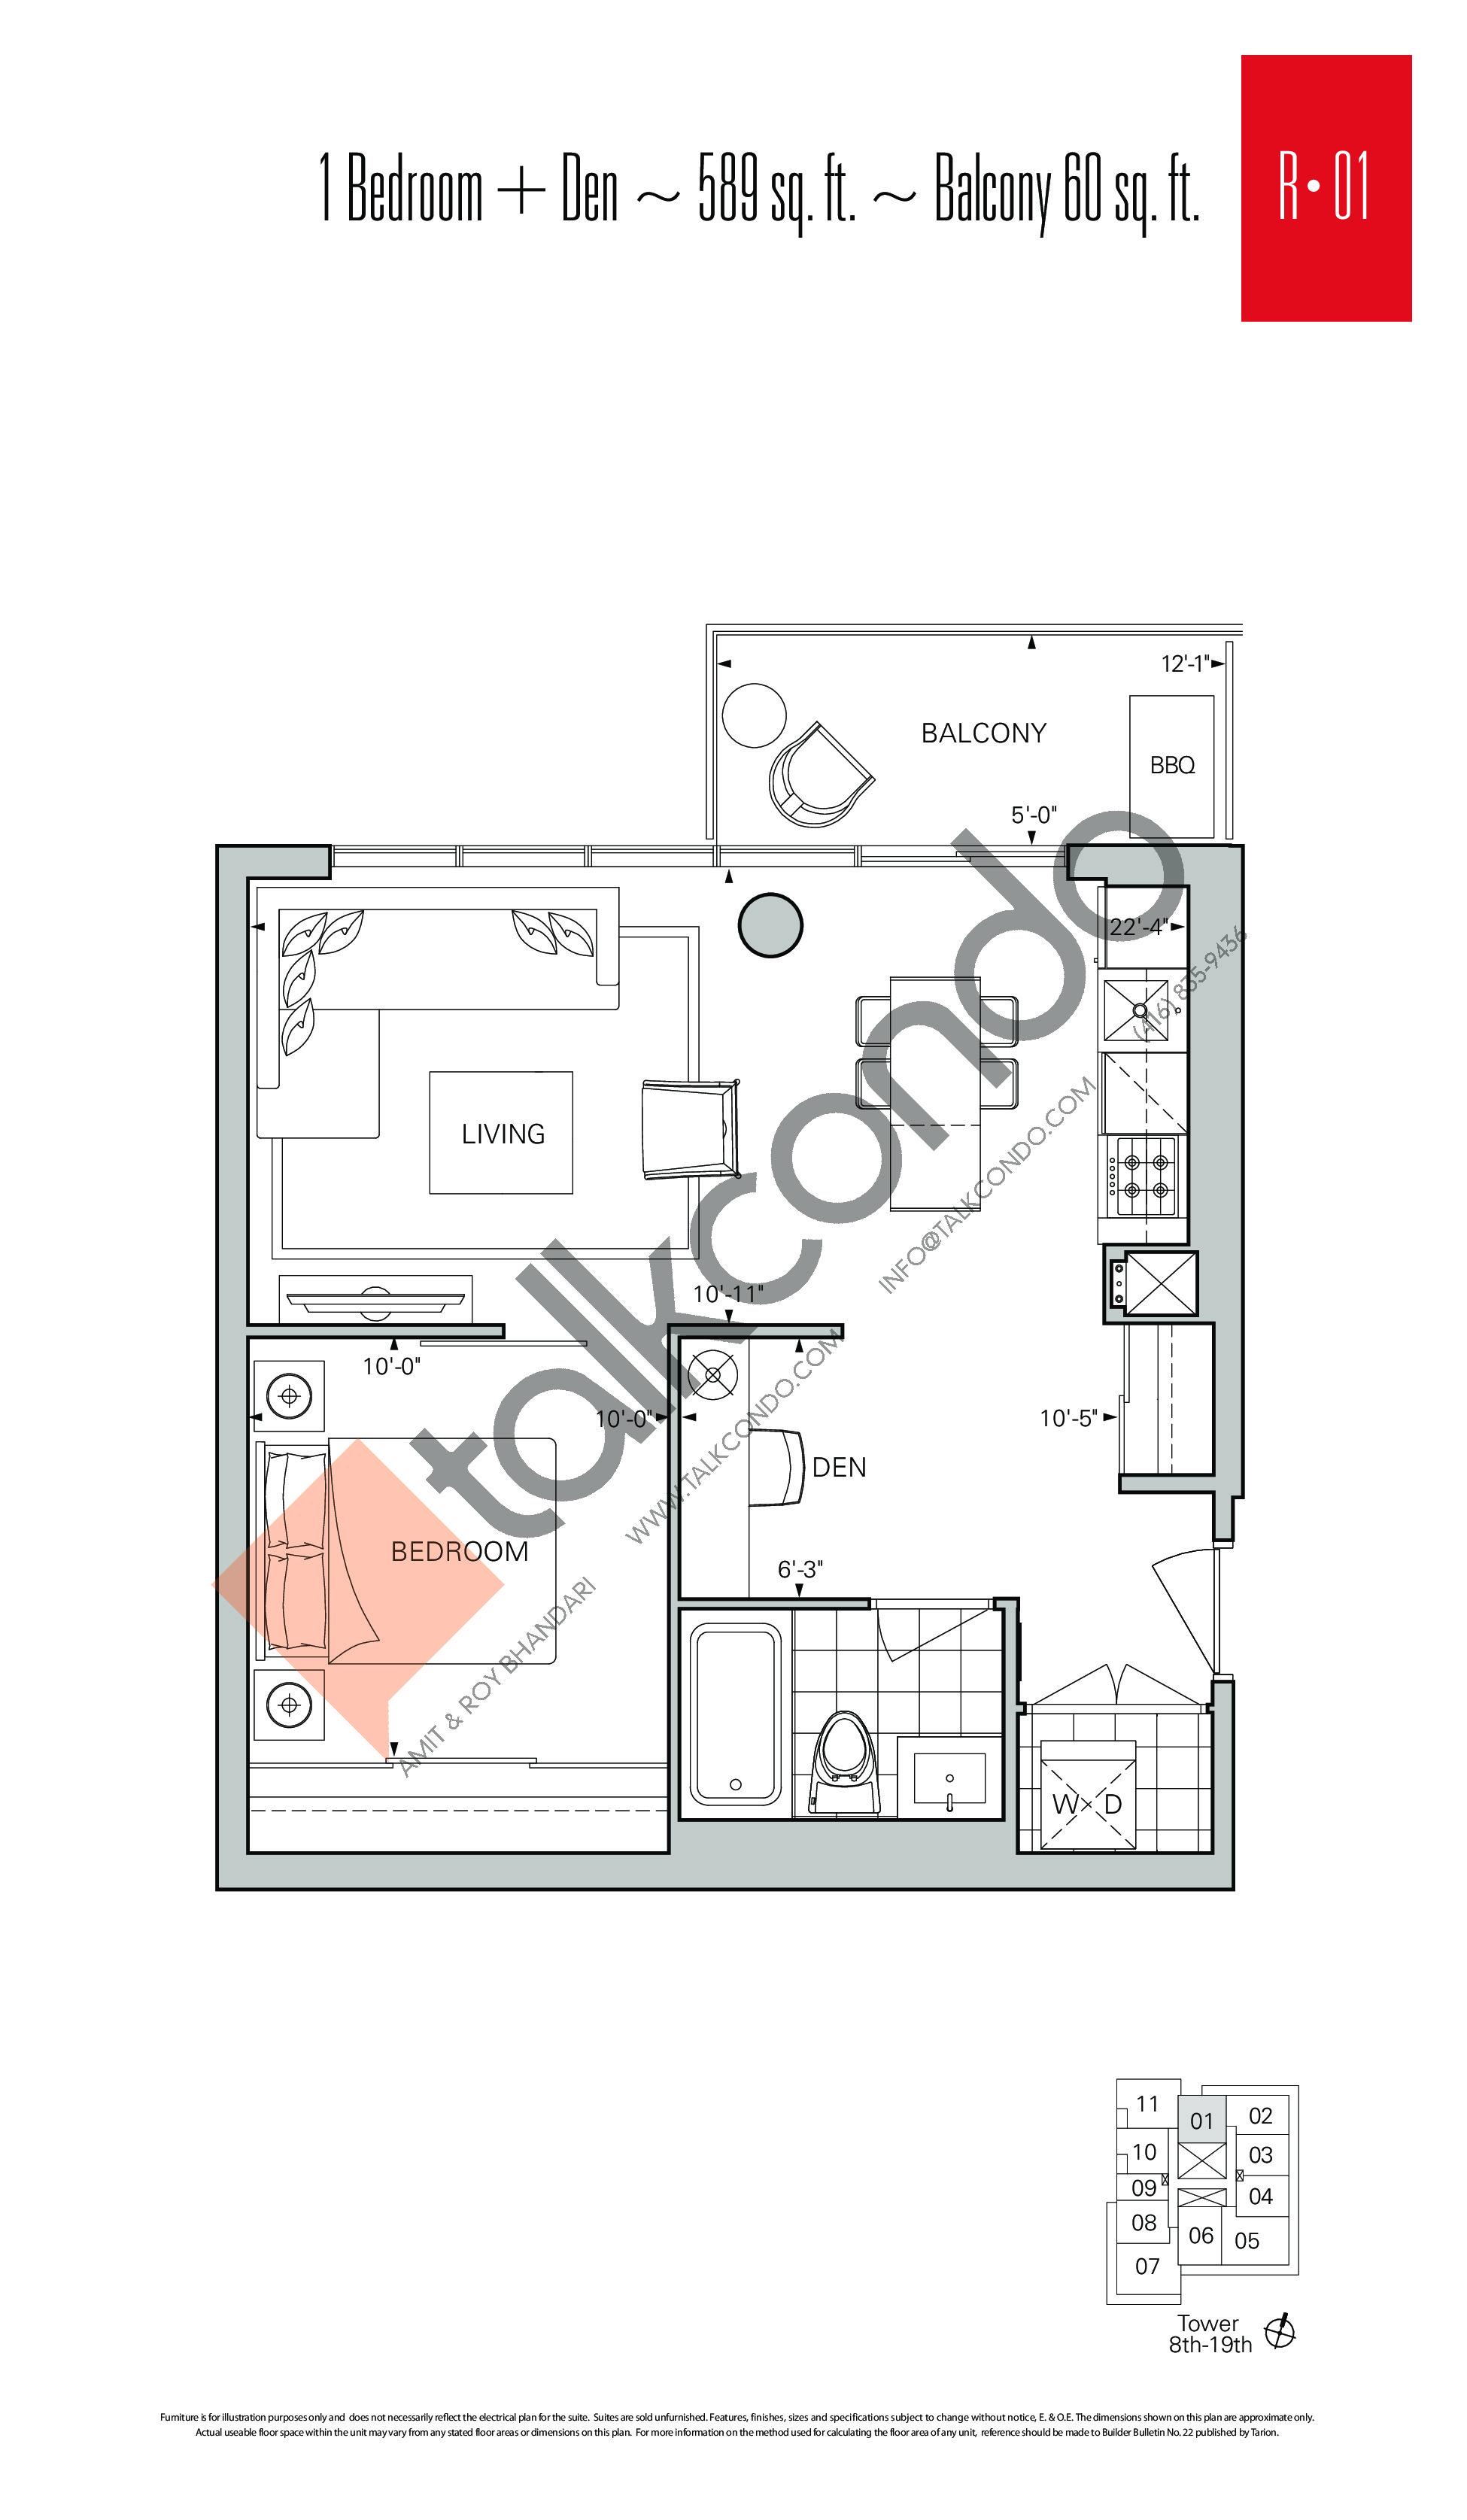 R-01 Floor Plan at Rise Condos - 589 sq.ft